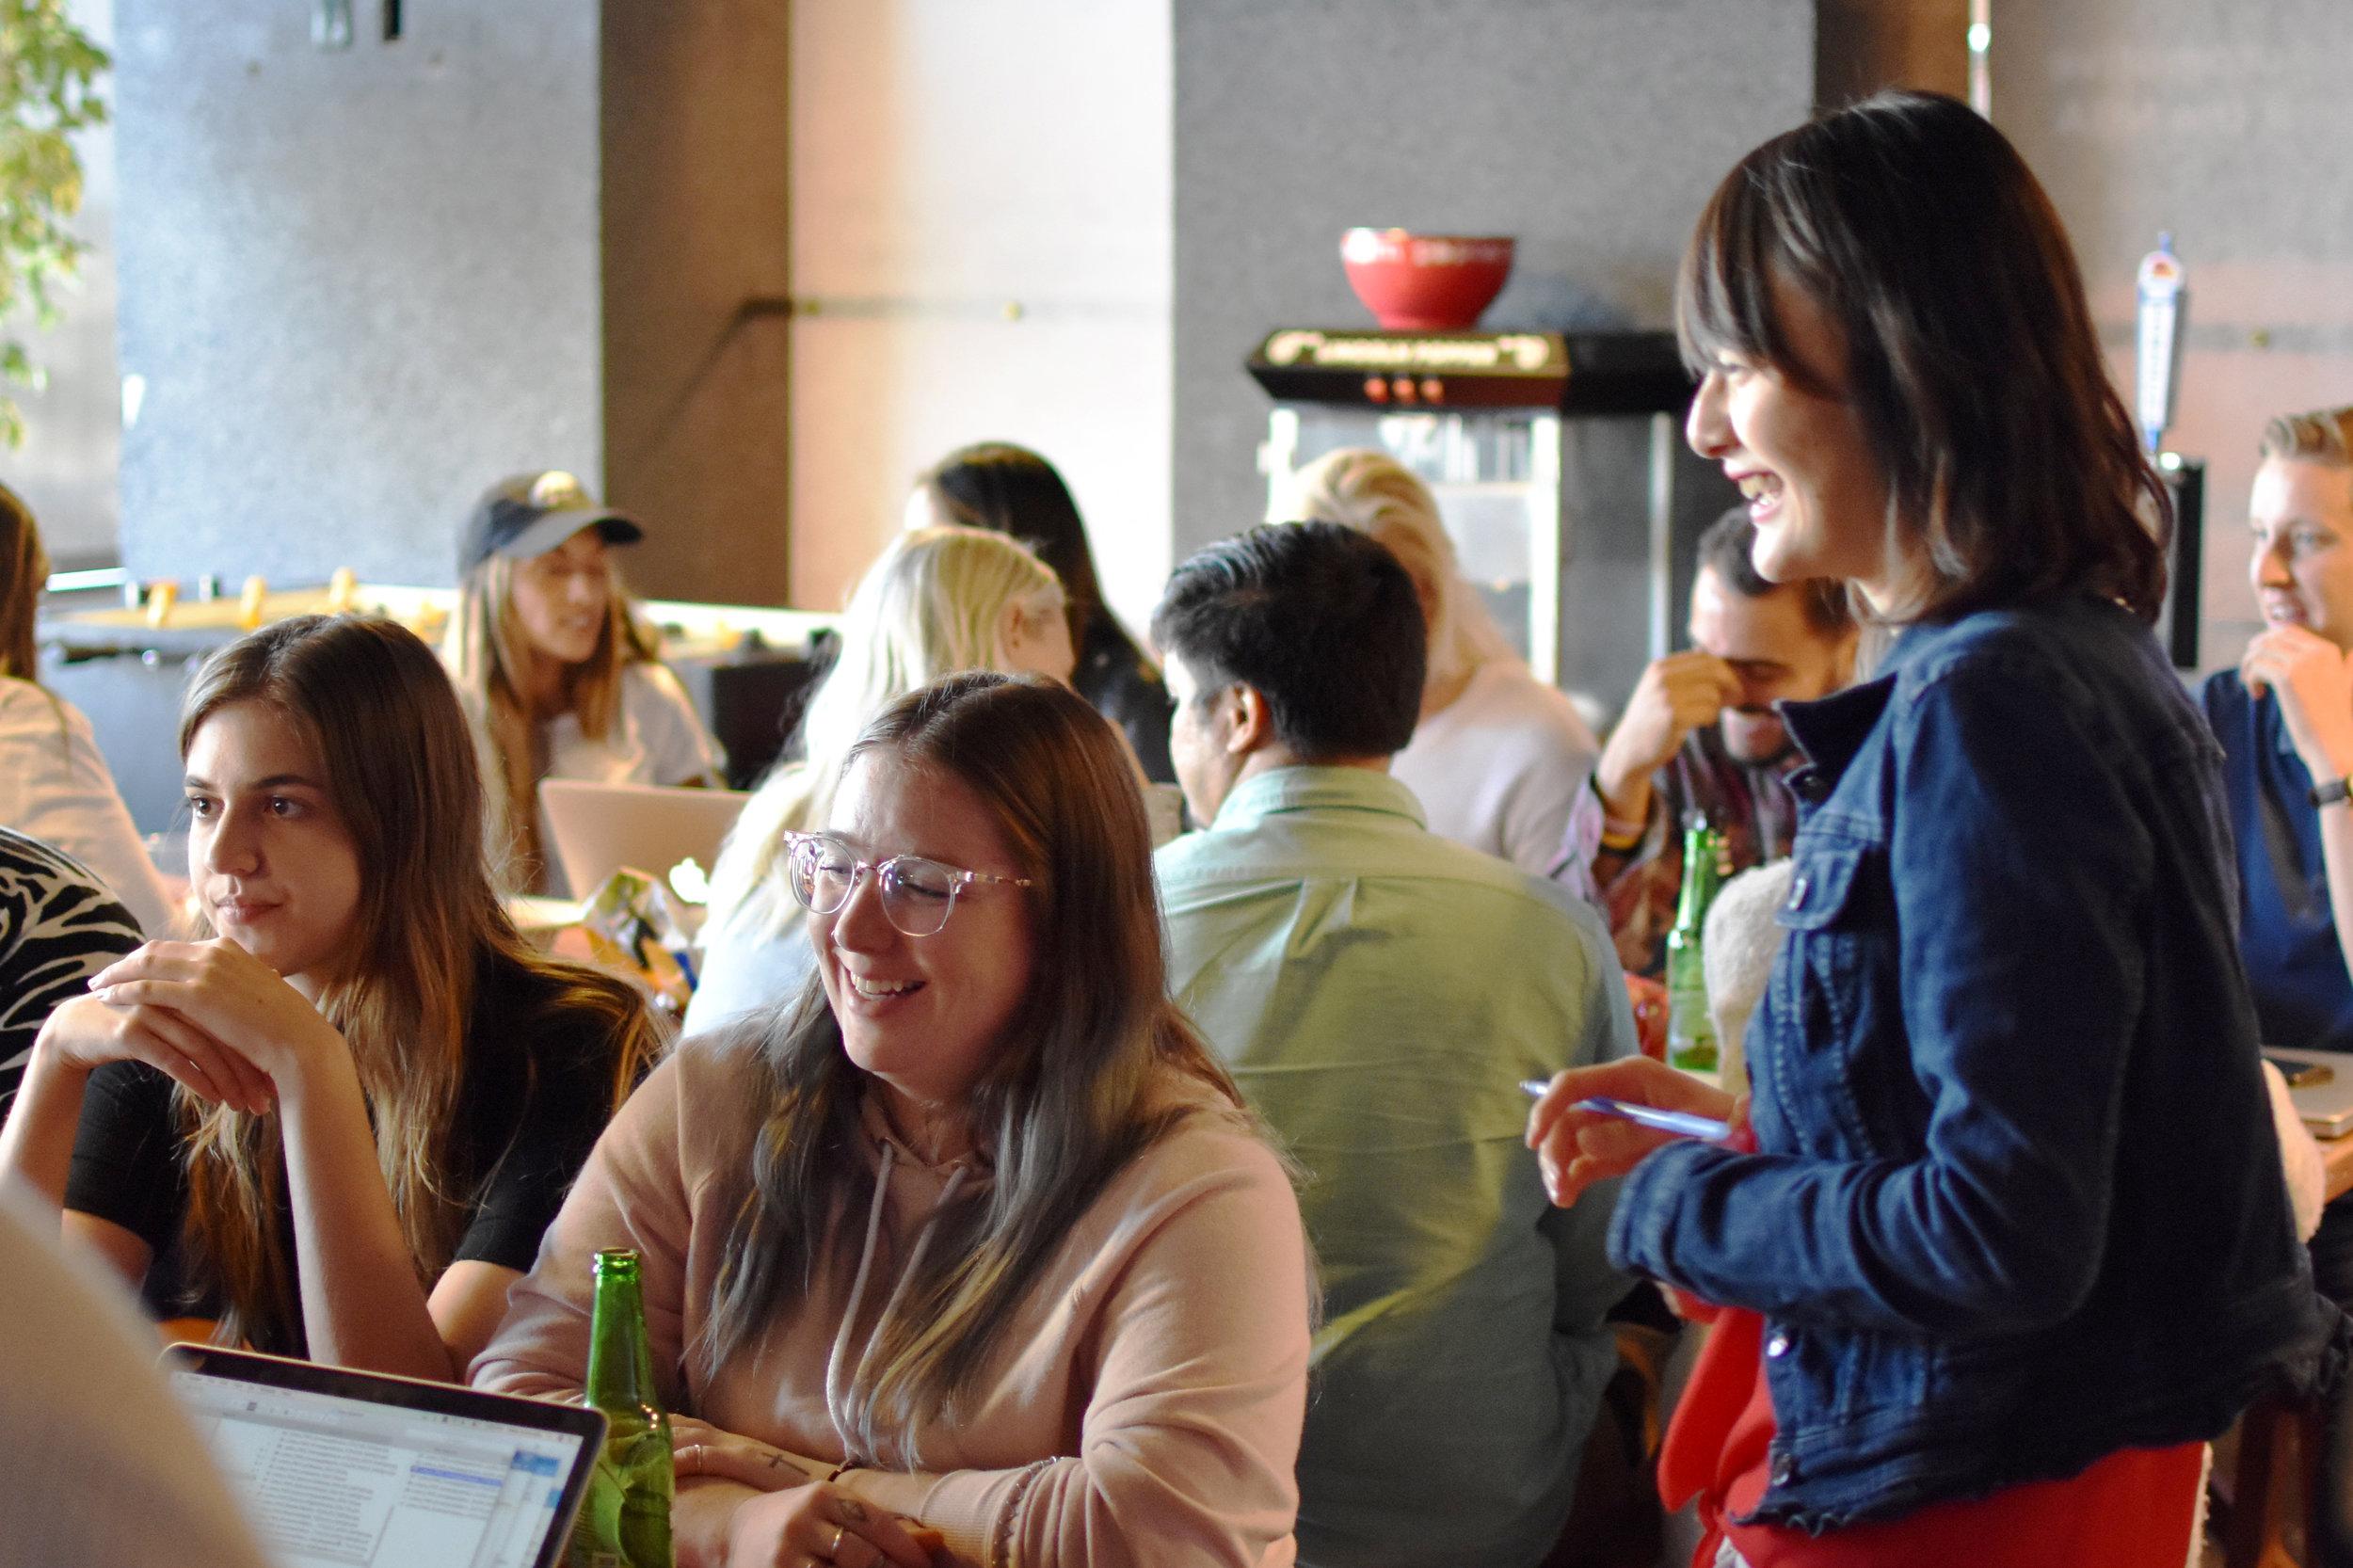 004 - Lynn chatting up a Team (2).jpg